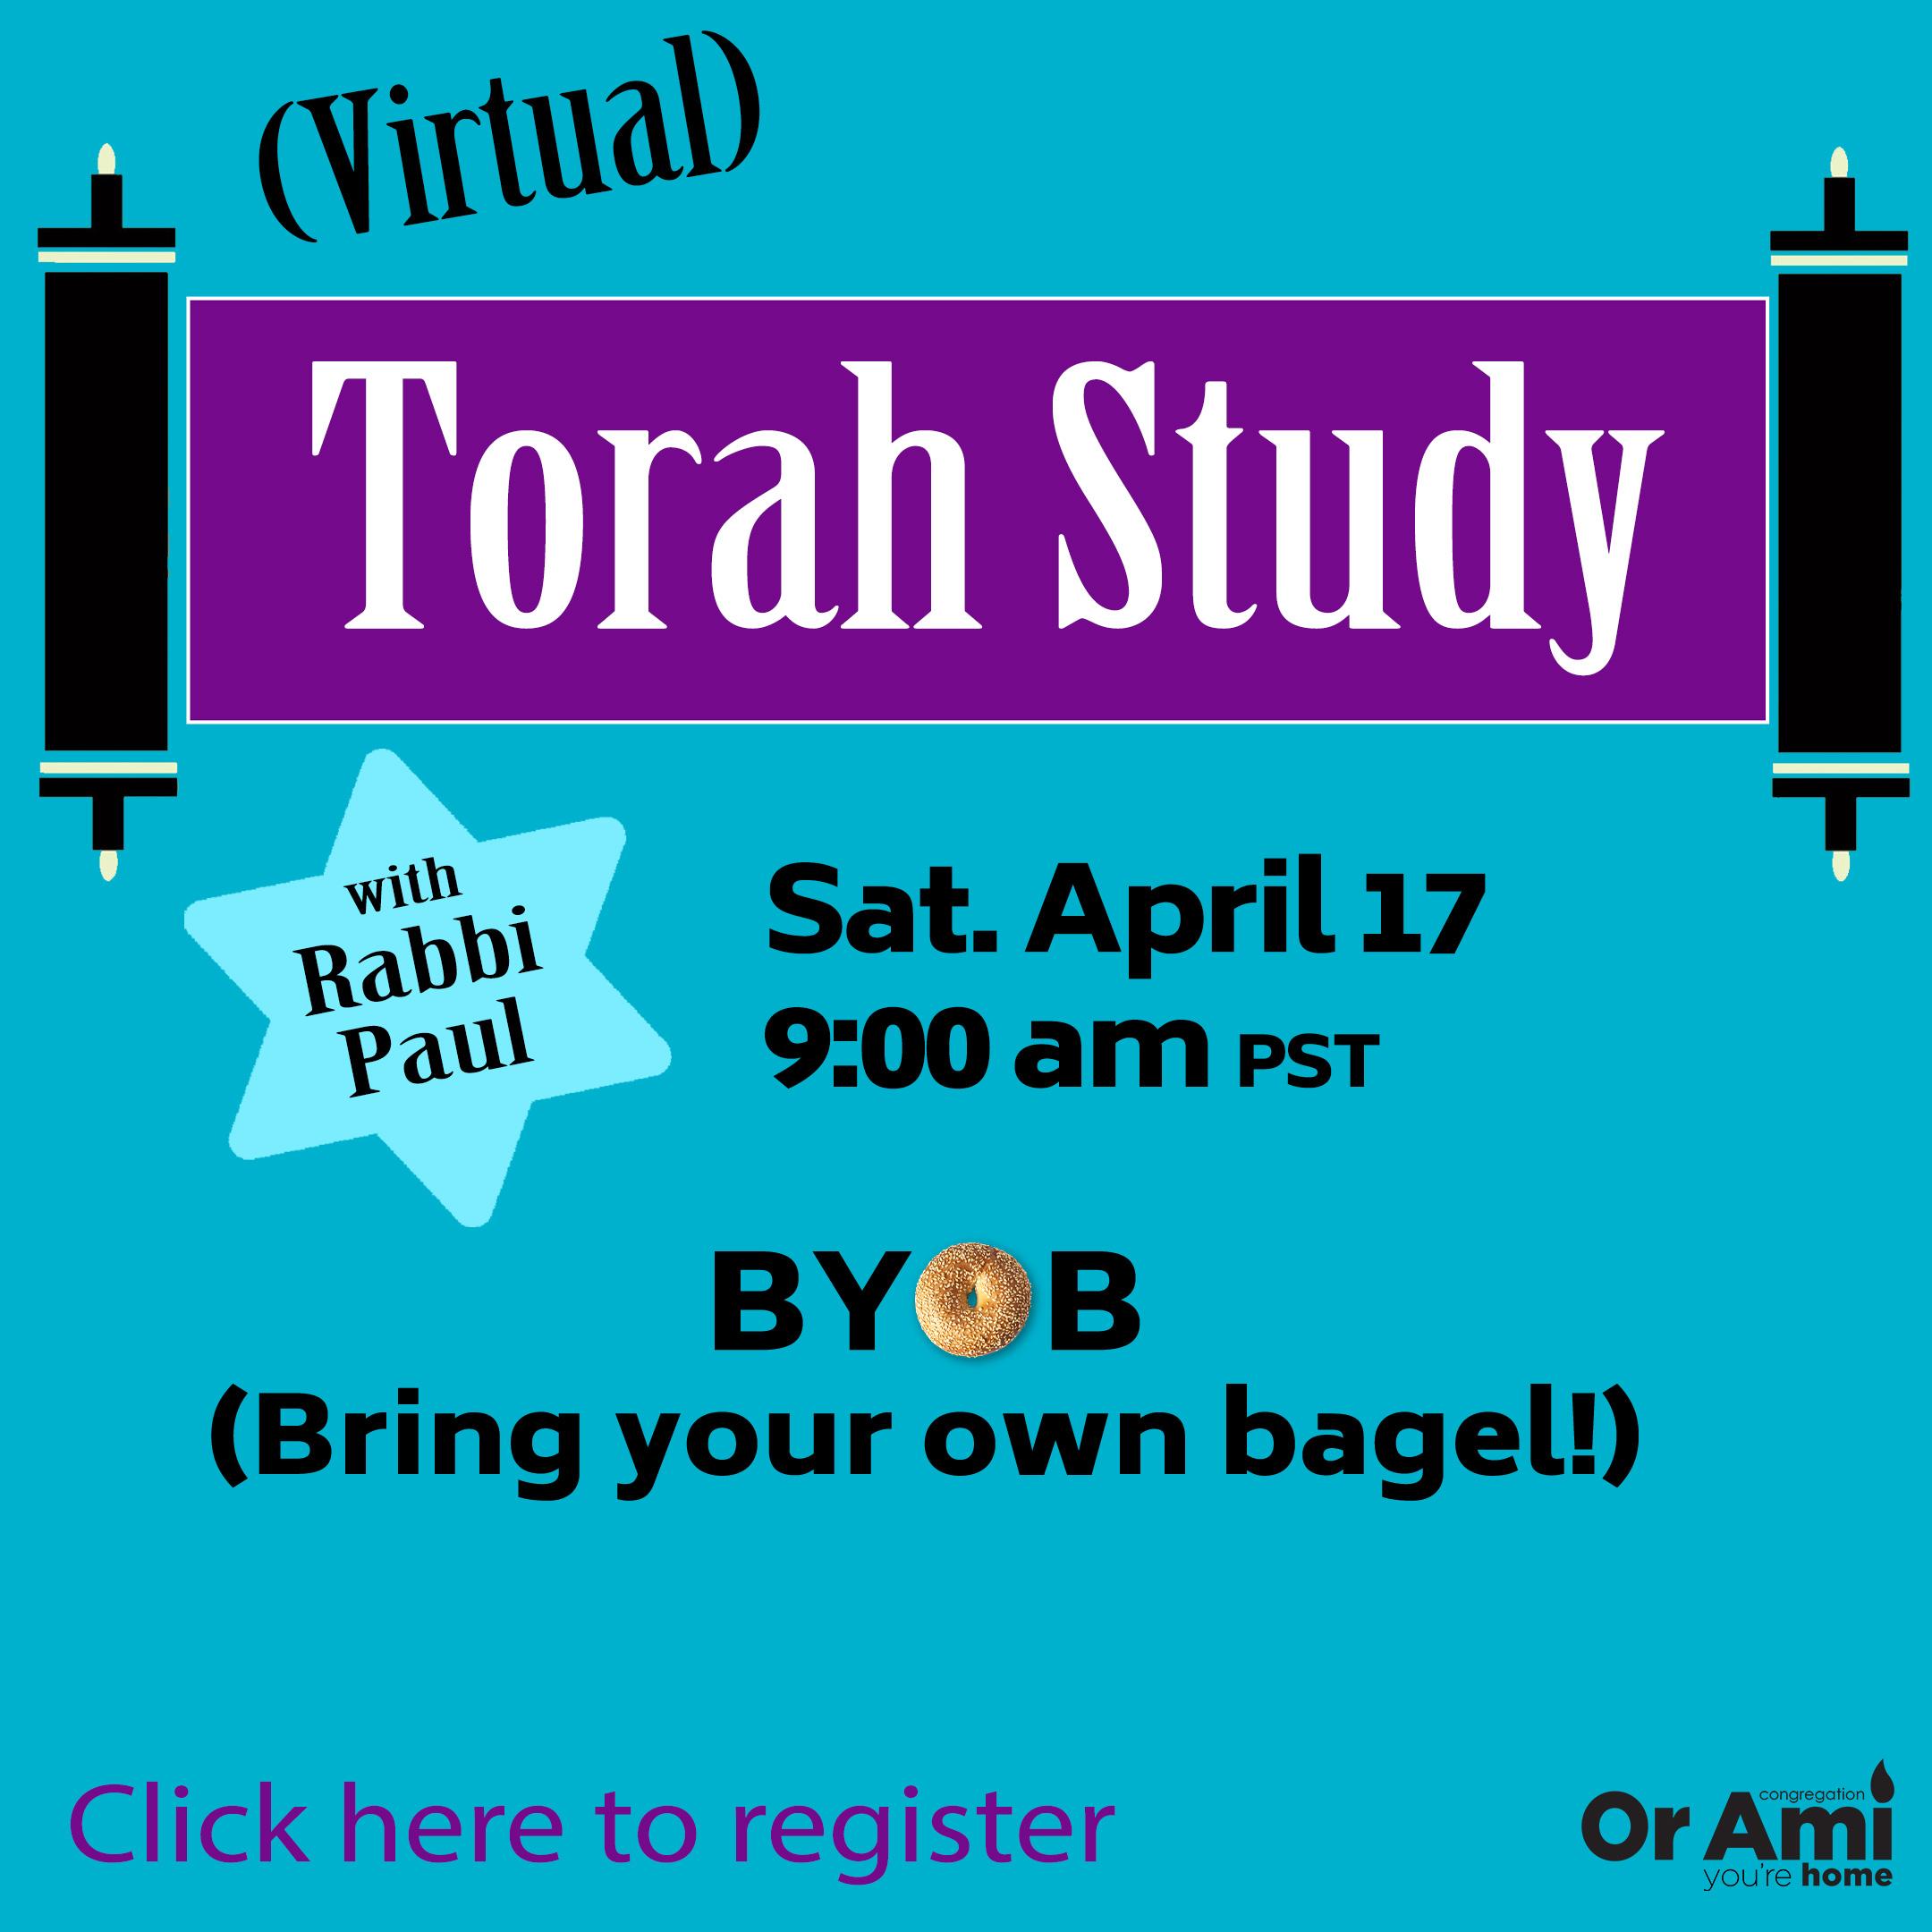 torah study new new 4_17 click here to register